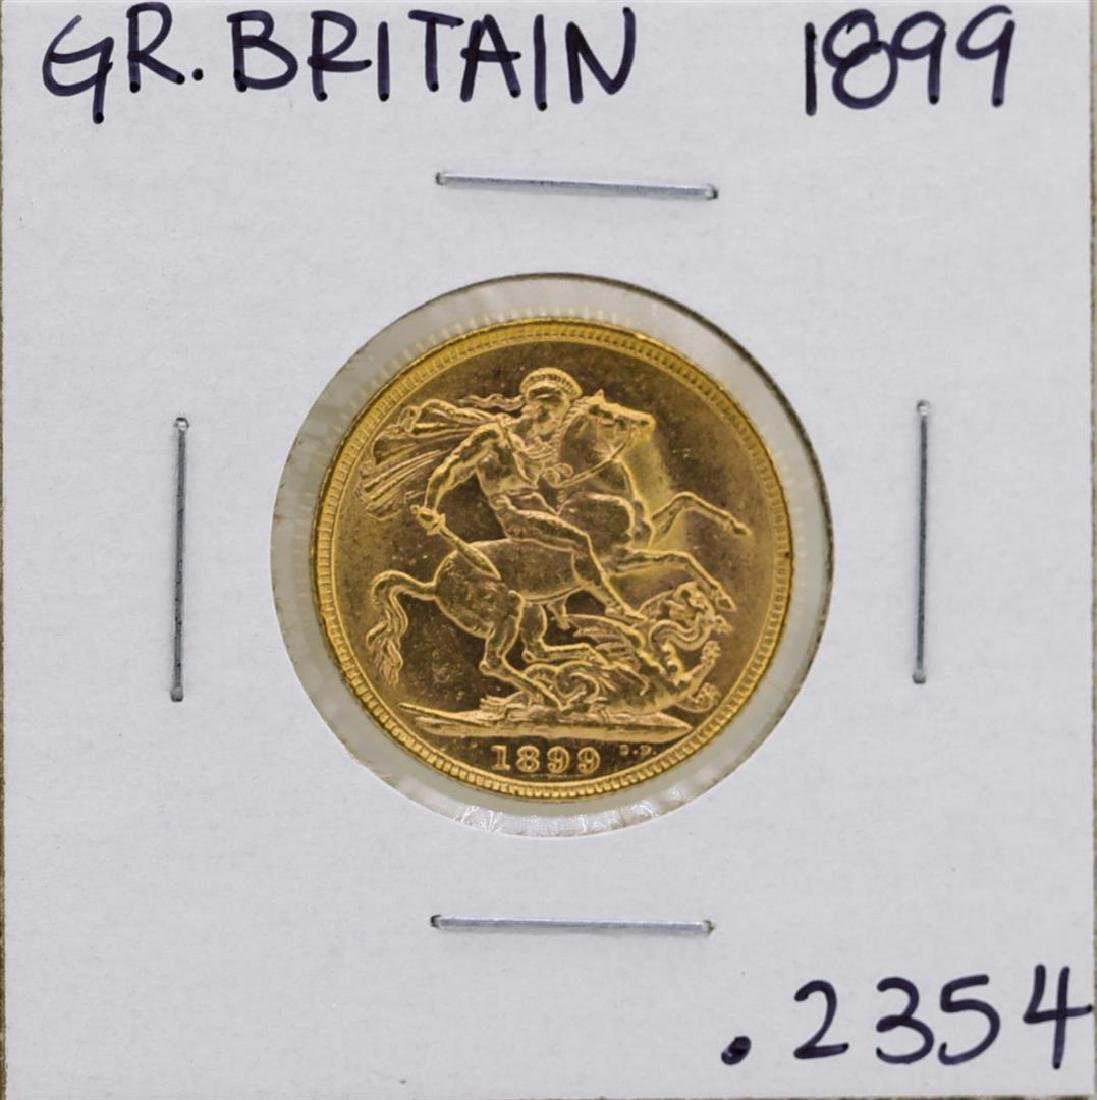 1899 Great Britain Queen Victoria Sovereign Gold Coin